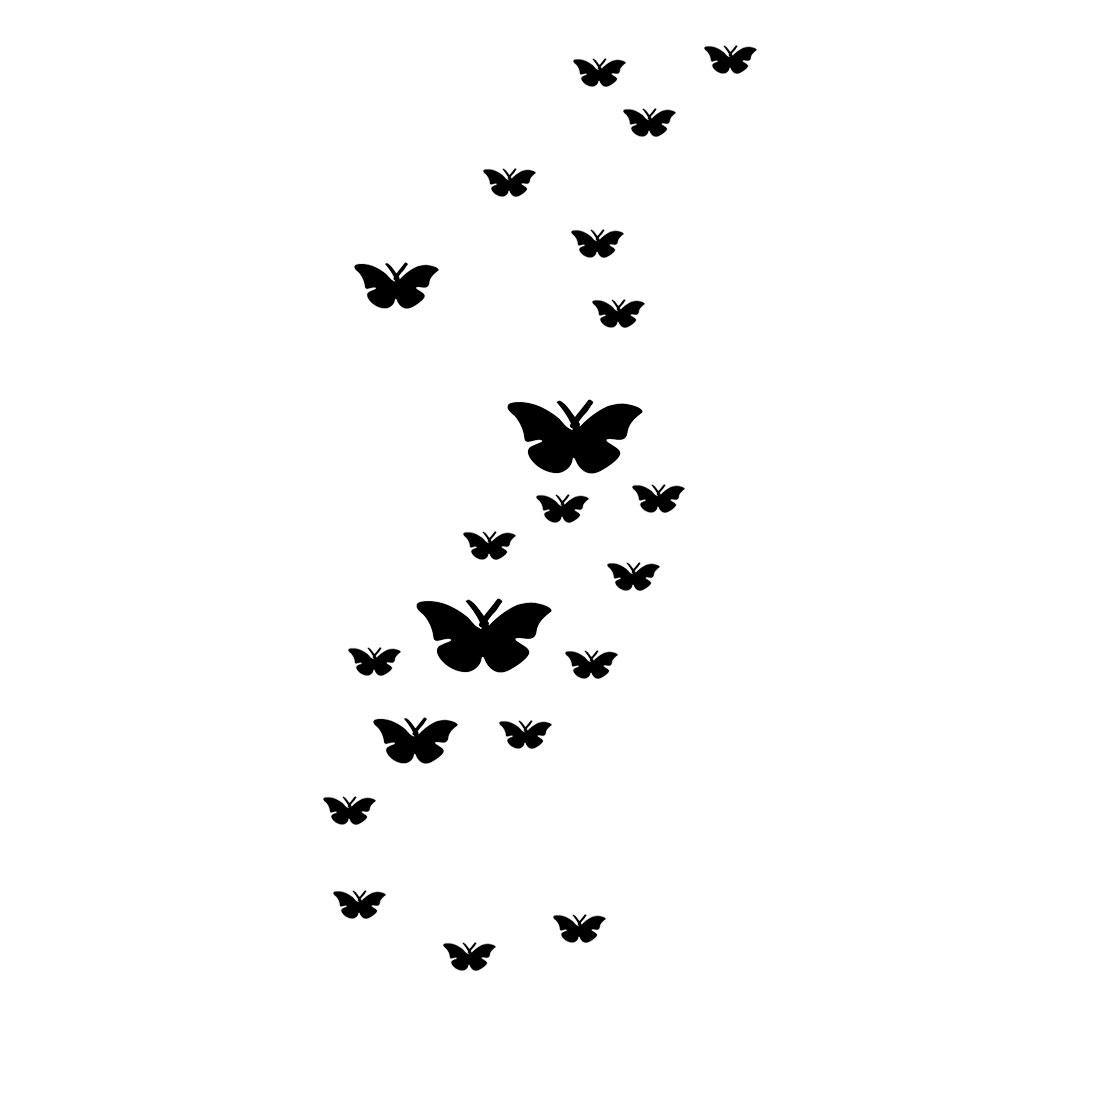 Room Acrylic Butterfly Shaped 3D Art Decor Mirror Wall Sticker Decal Black